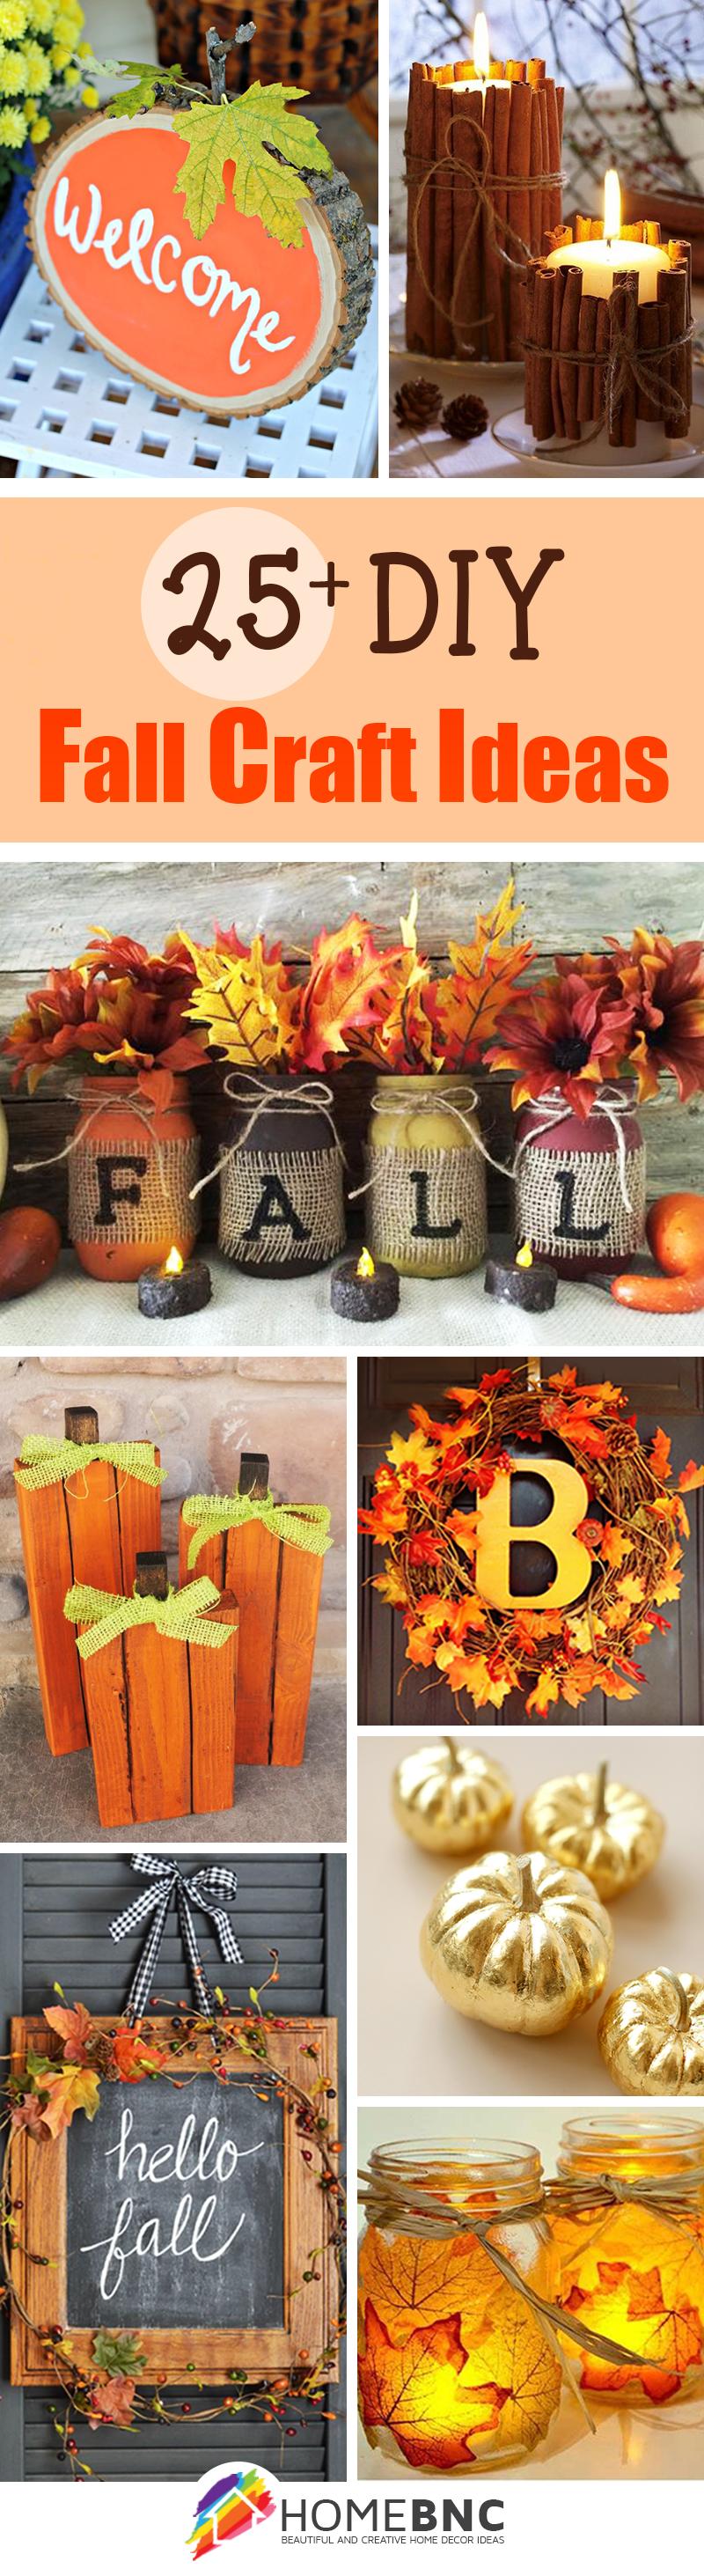 28 Fancy Diy Fall Craft Ideas To Bring Autumn Your Home Har Com